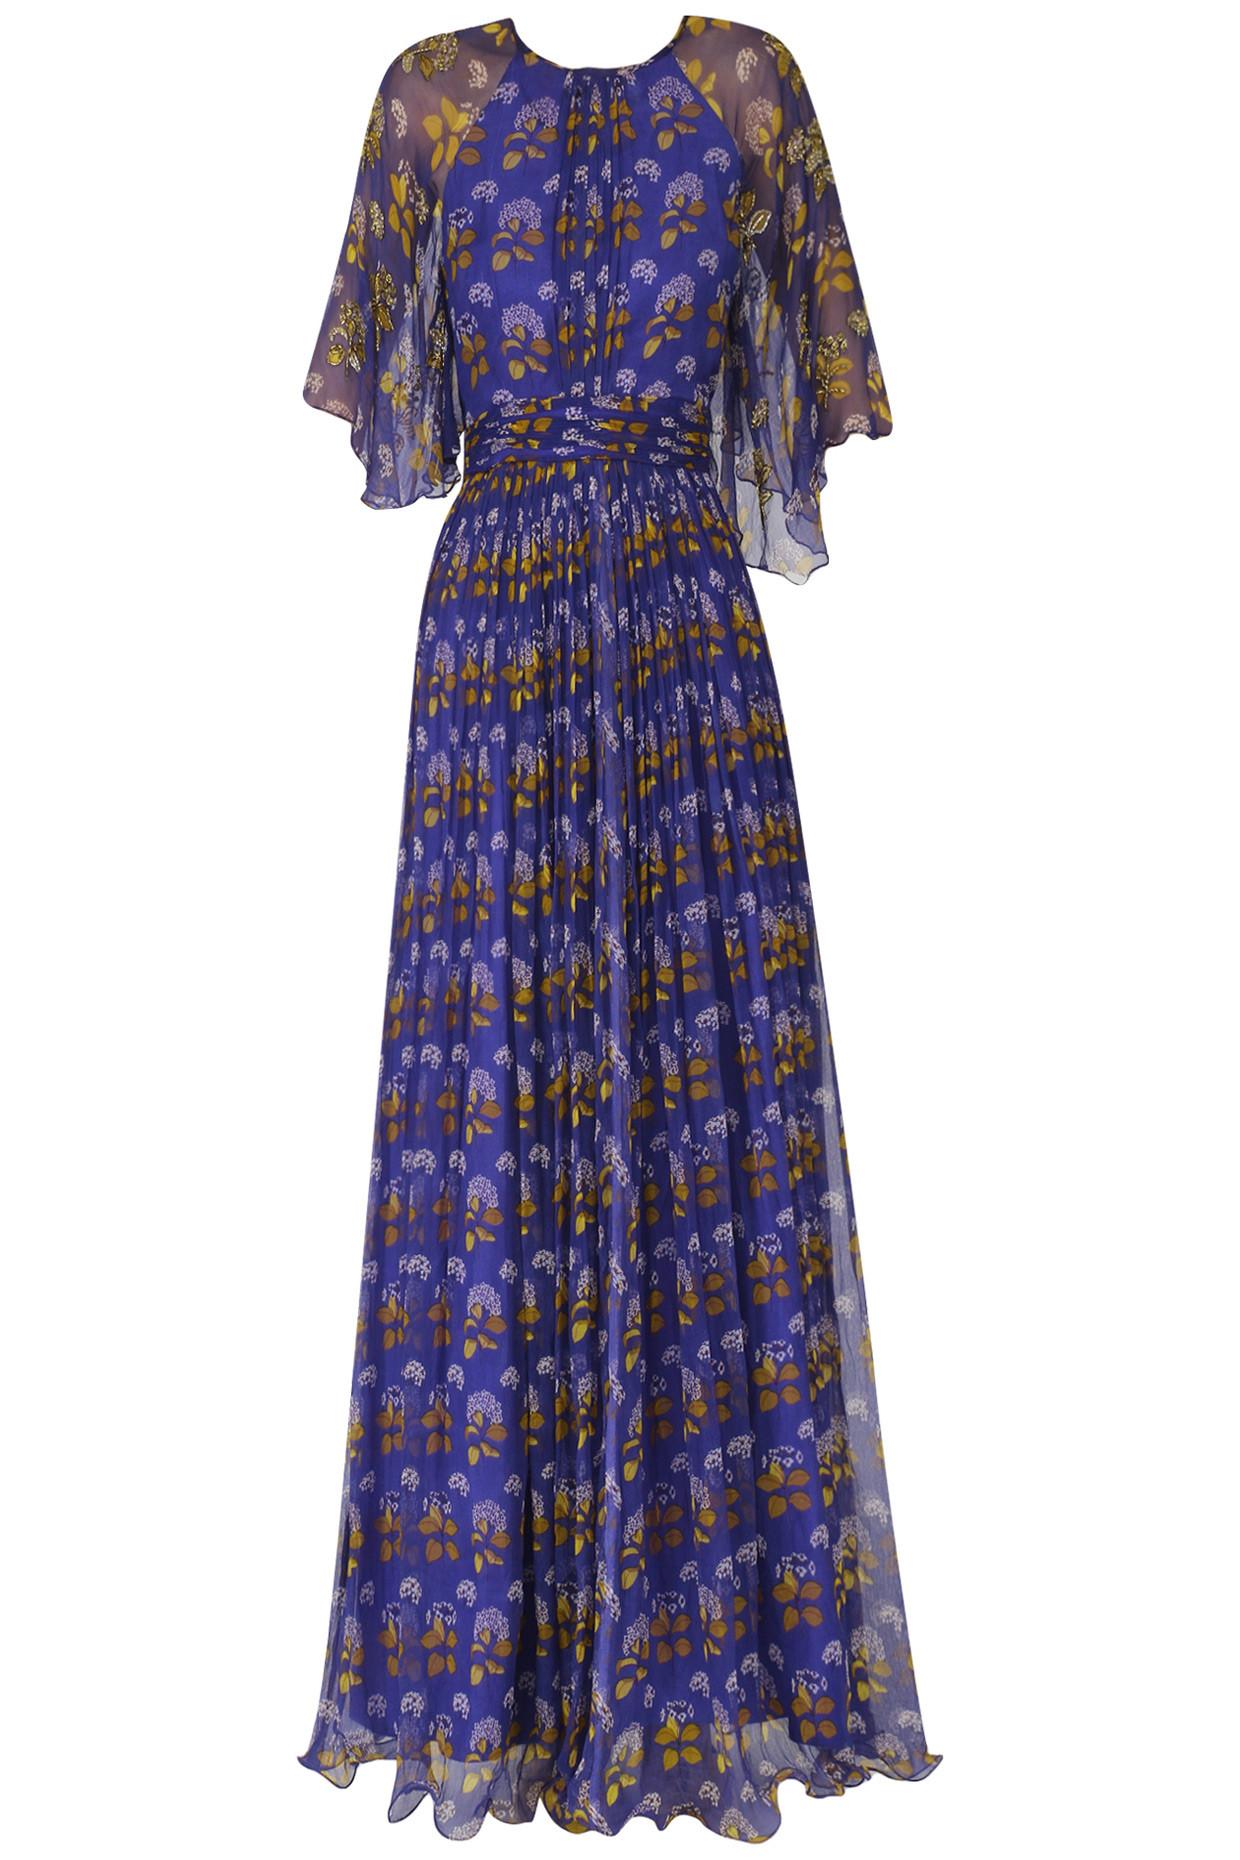 Royal Blue Kimono Maxi Dress by Pallavi Jaipur